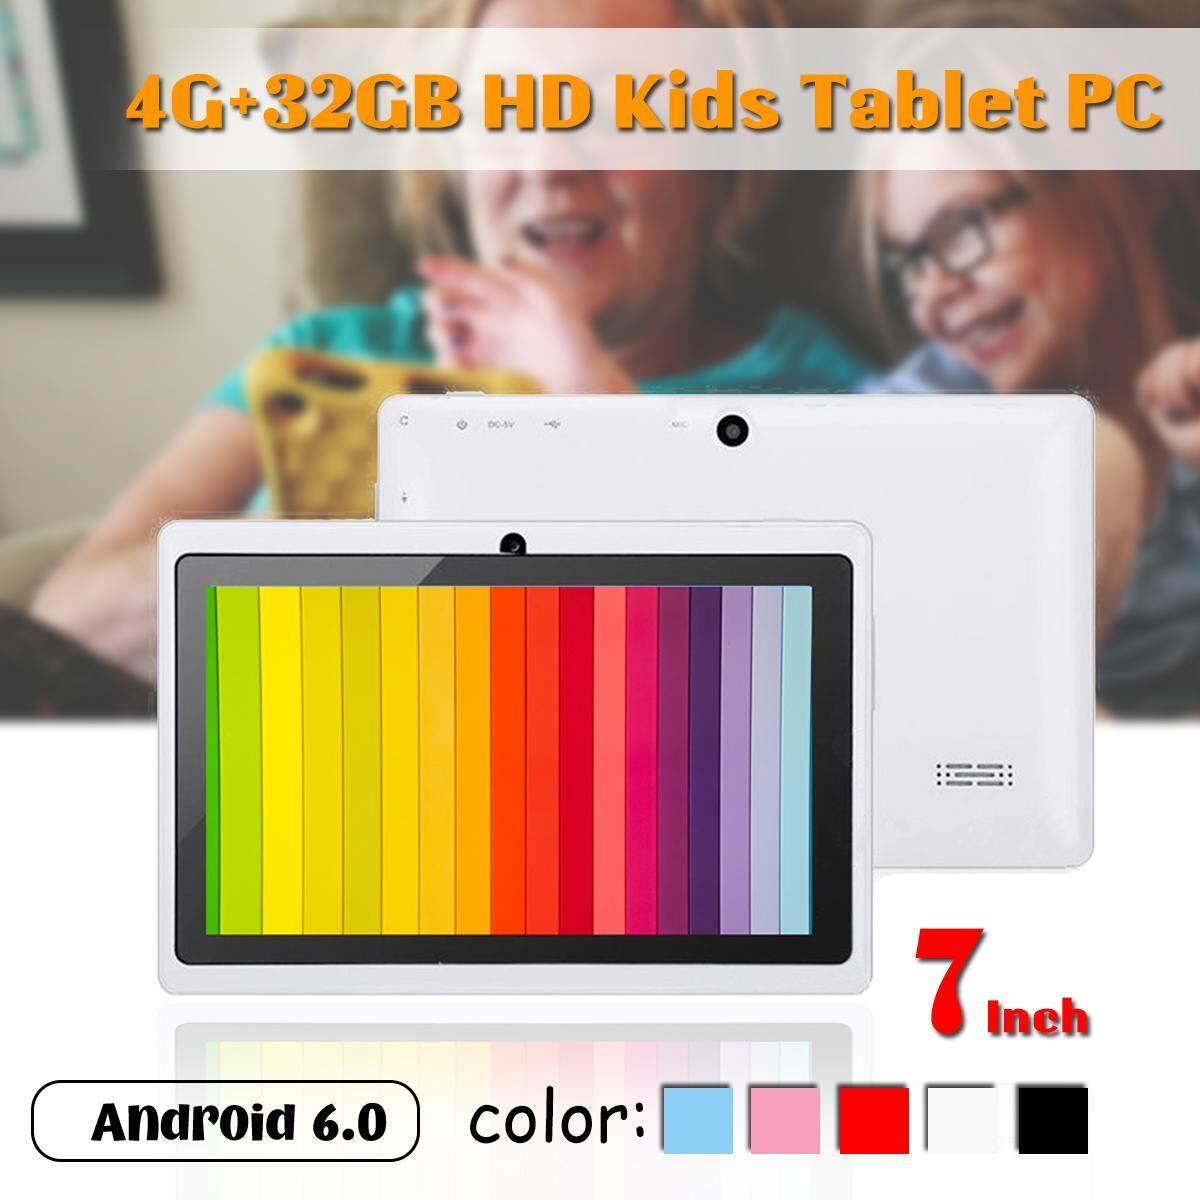 7'' HD Kids Tablet PC 4G+32GB Android 6.0 Quad Core 4000mAh Children Pad WIFI bluetooth Tab